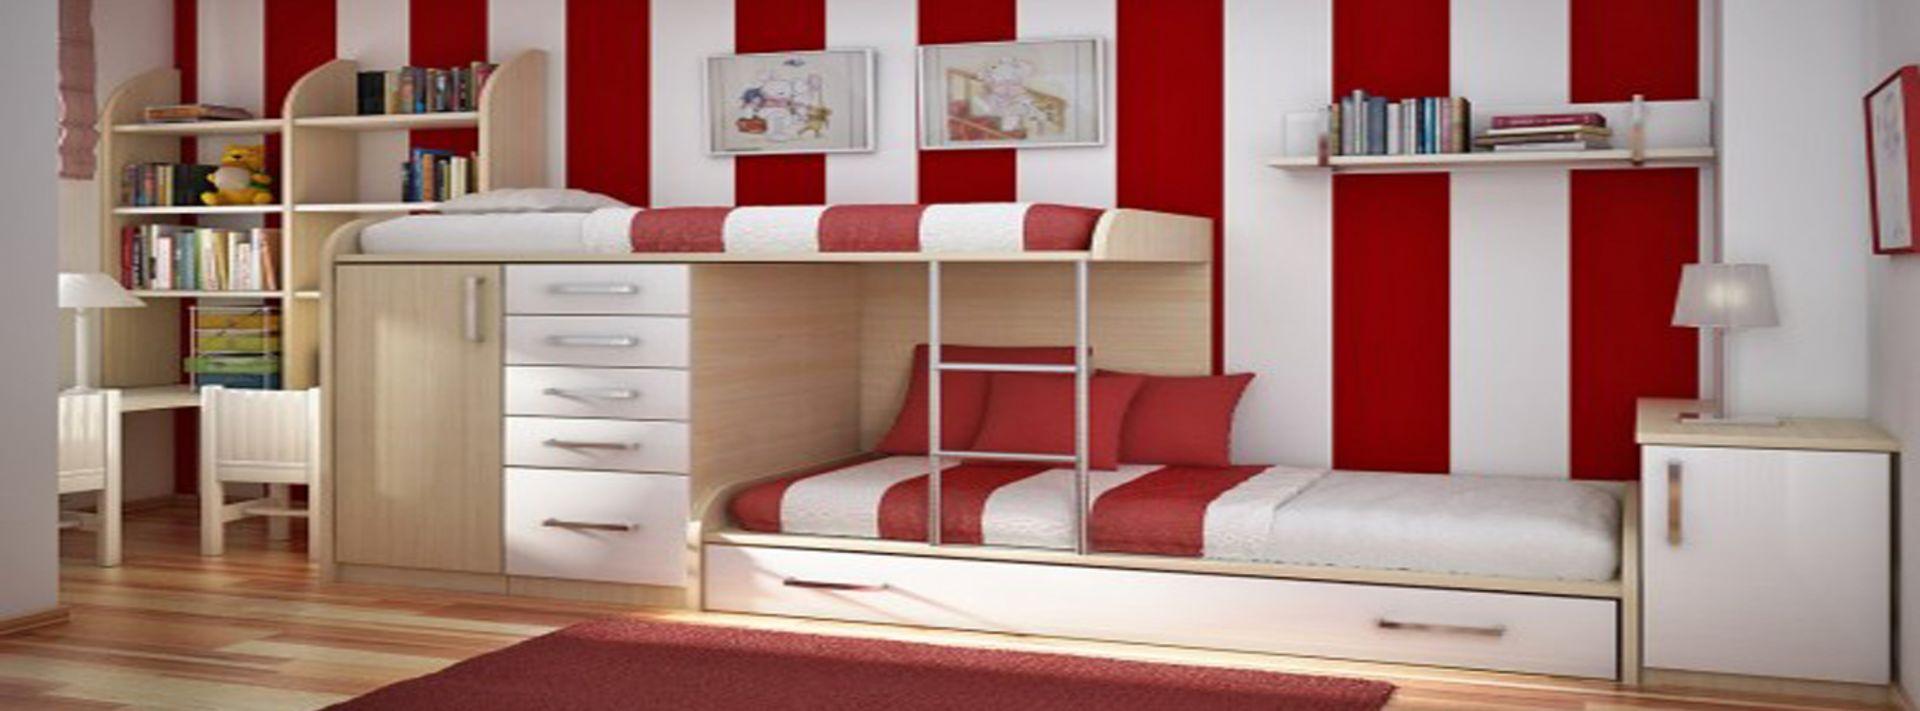 4 Tips for Teen Bedroom Decorations